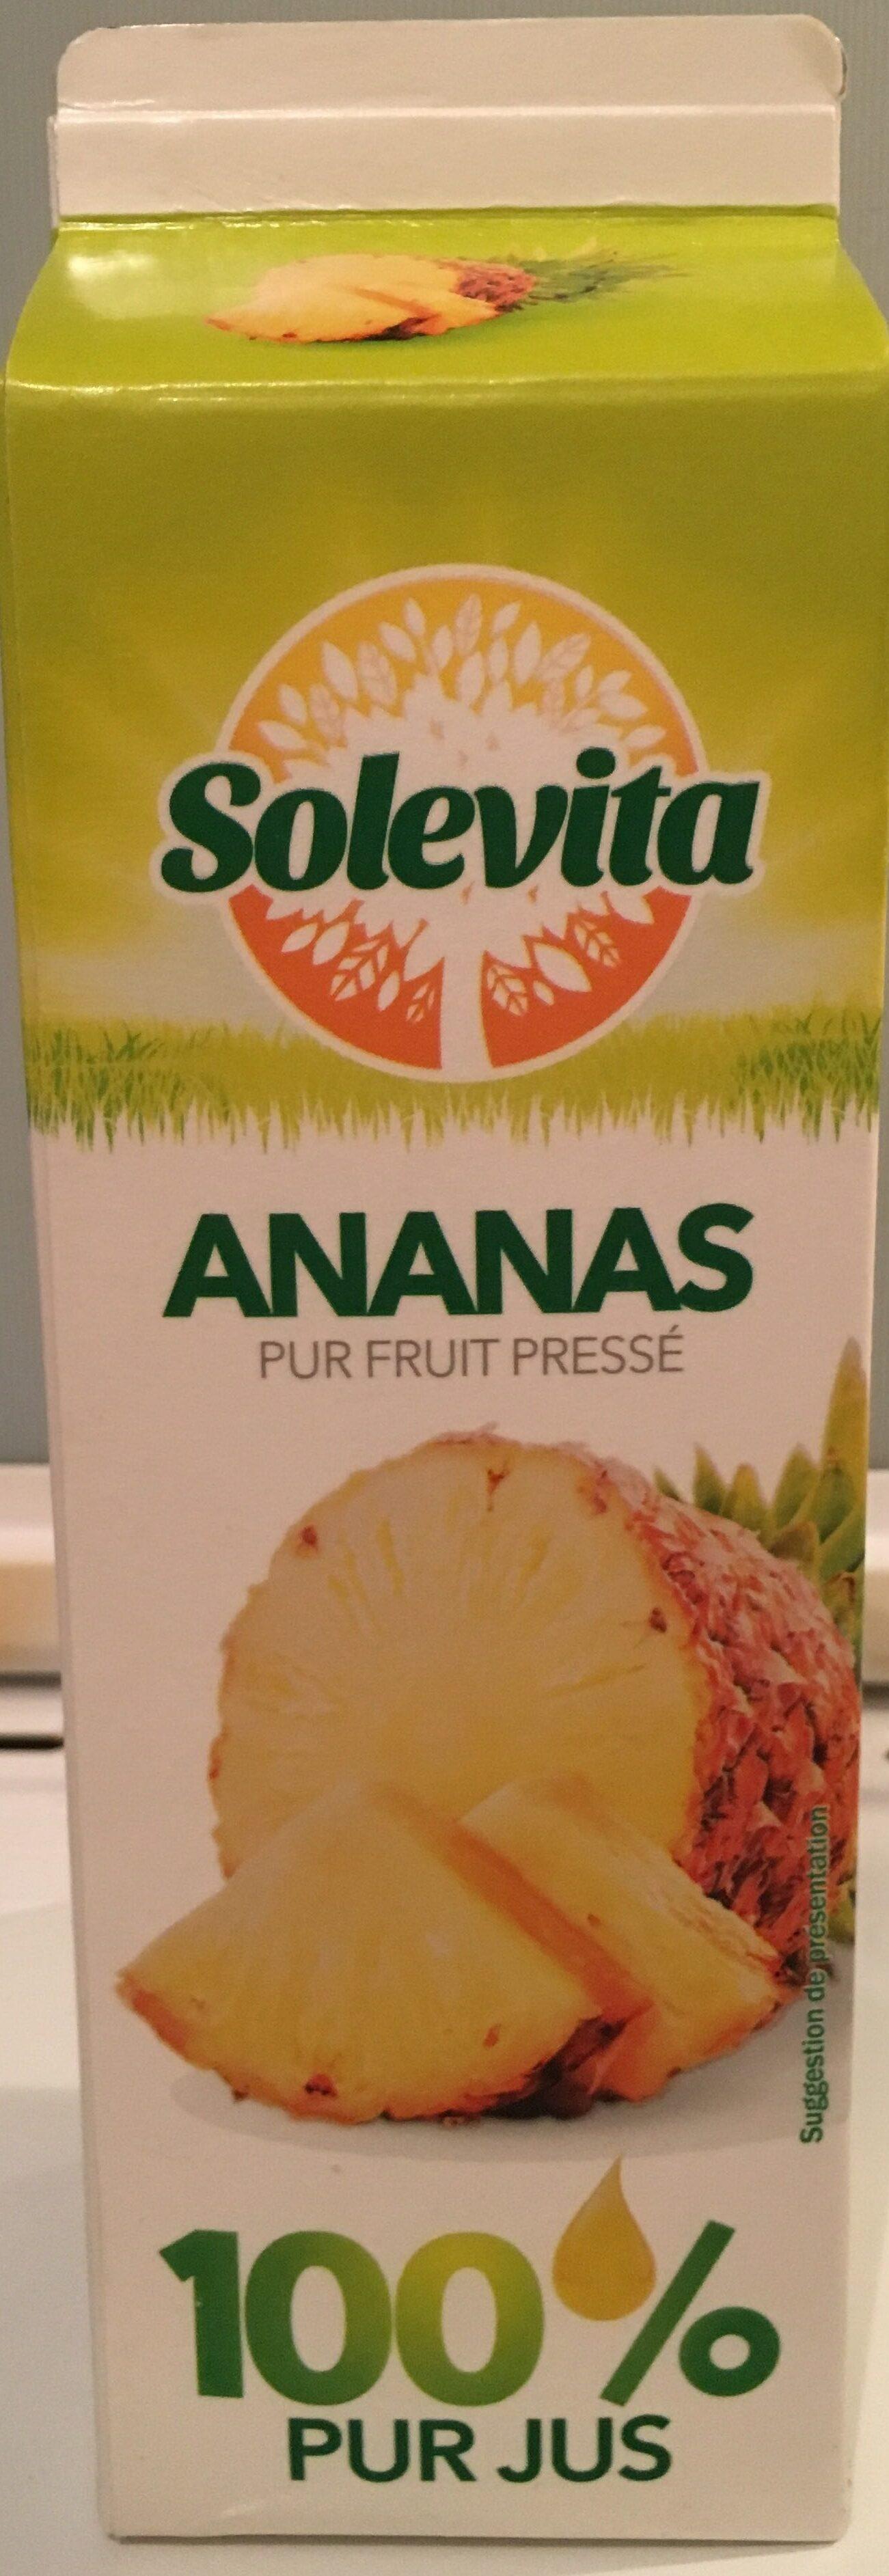 Ananas 100% pur jus - Produkt - fr